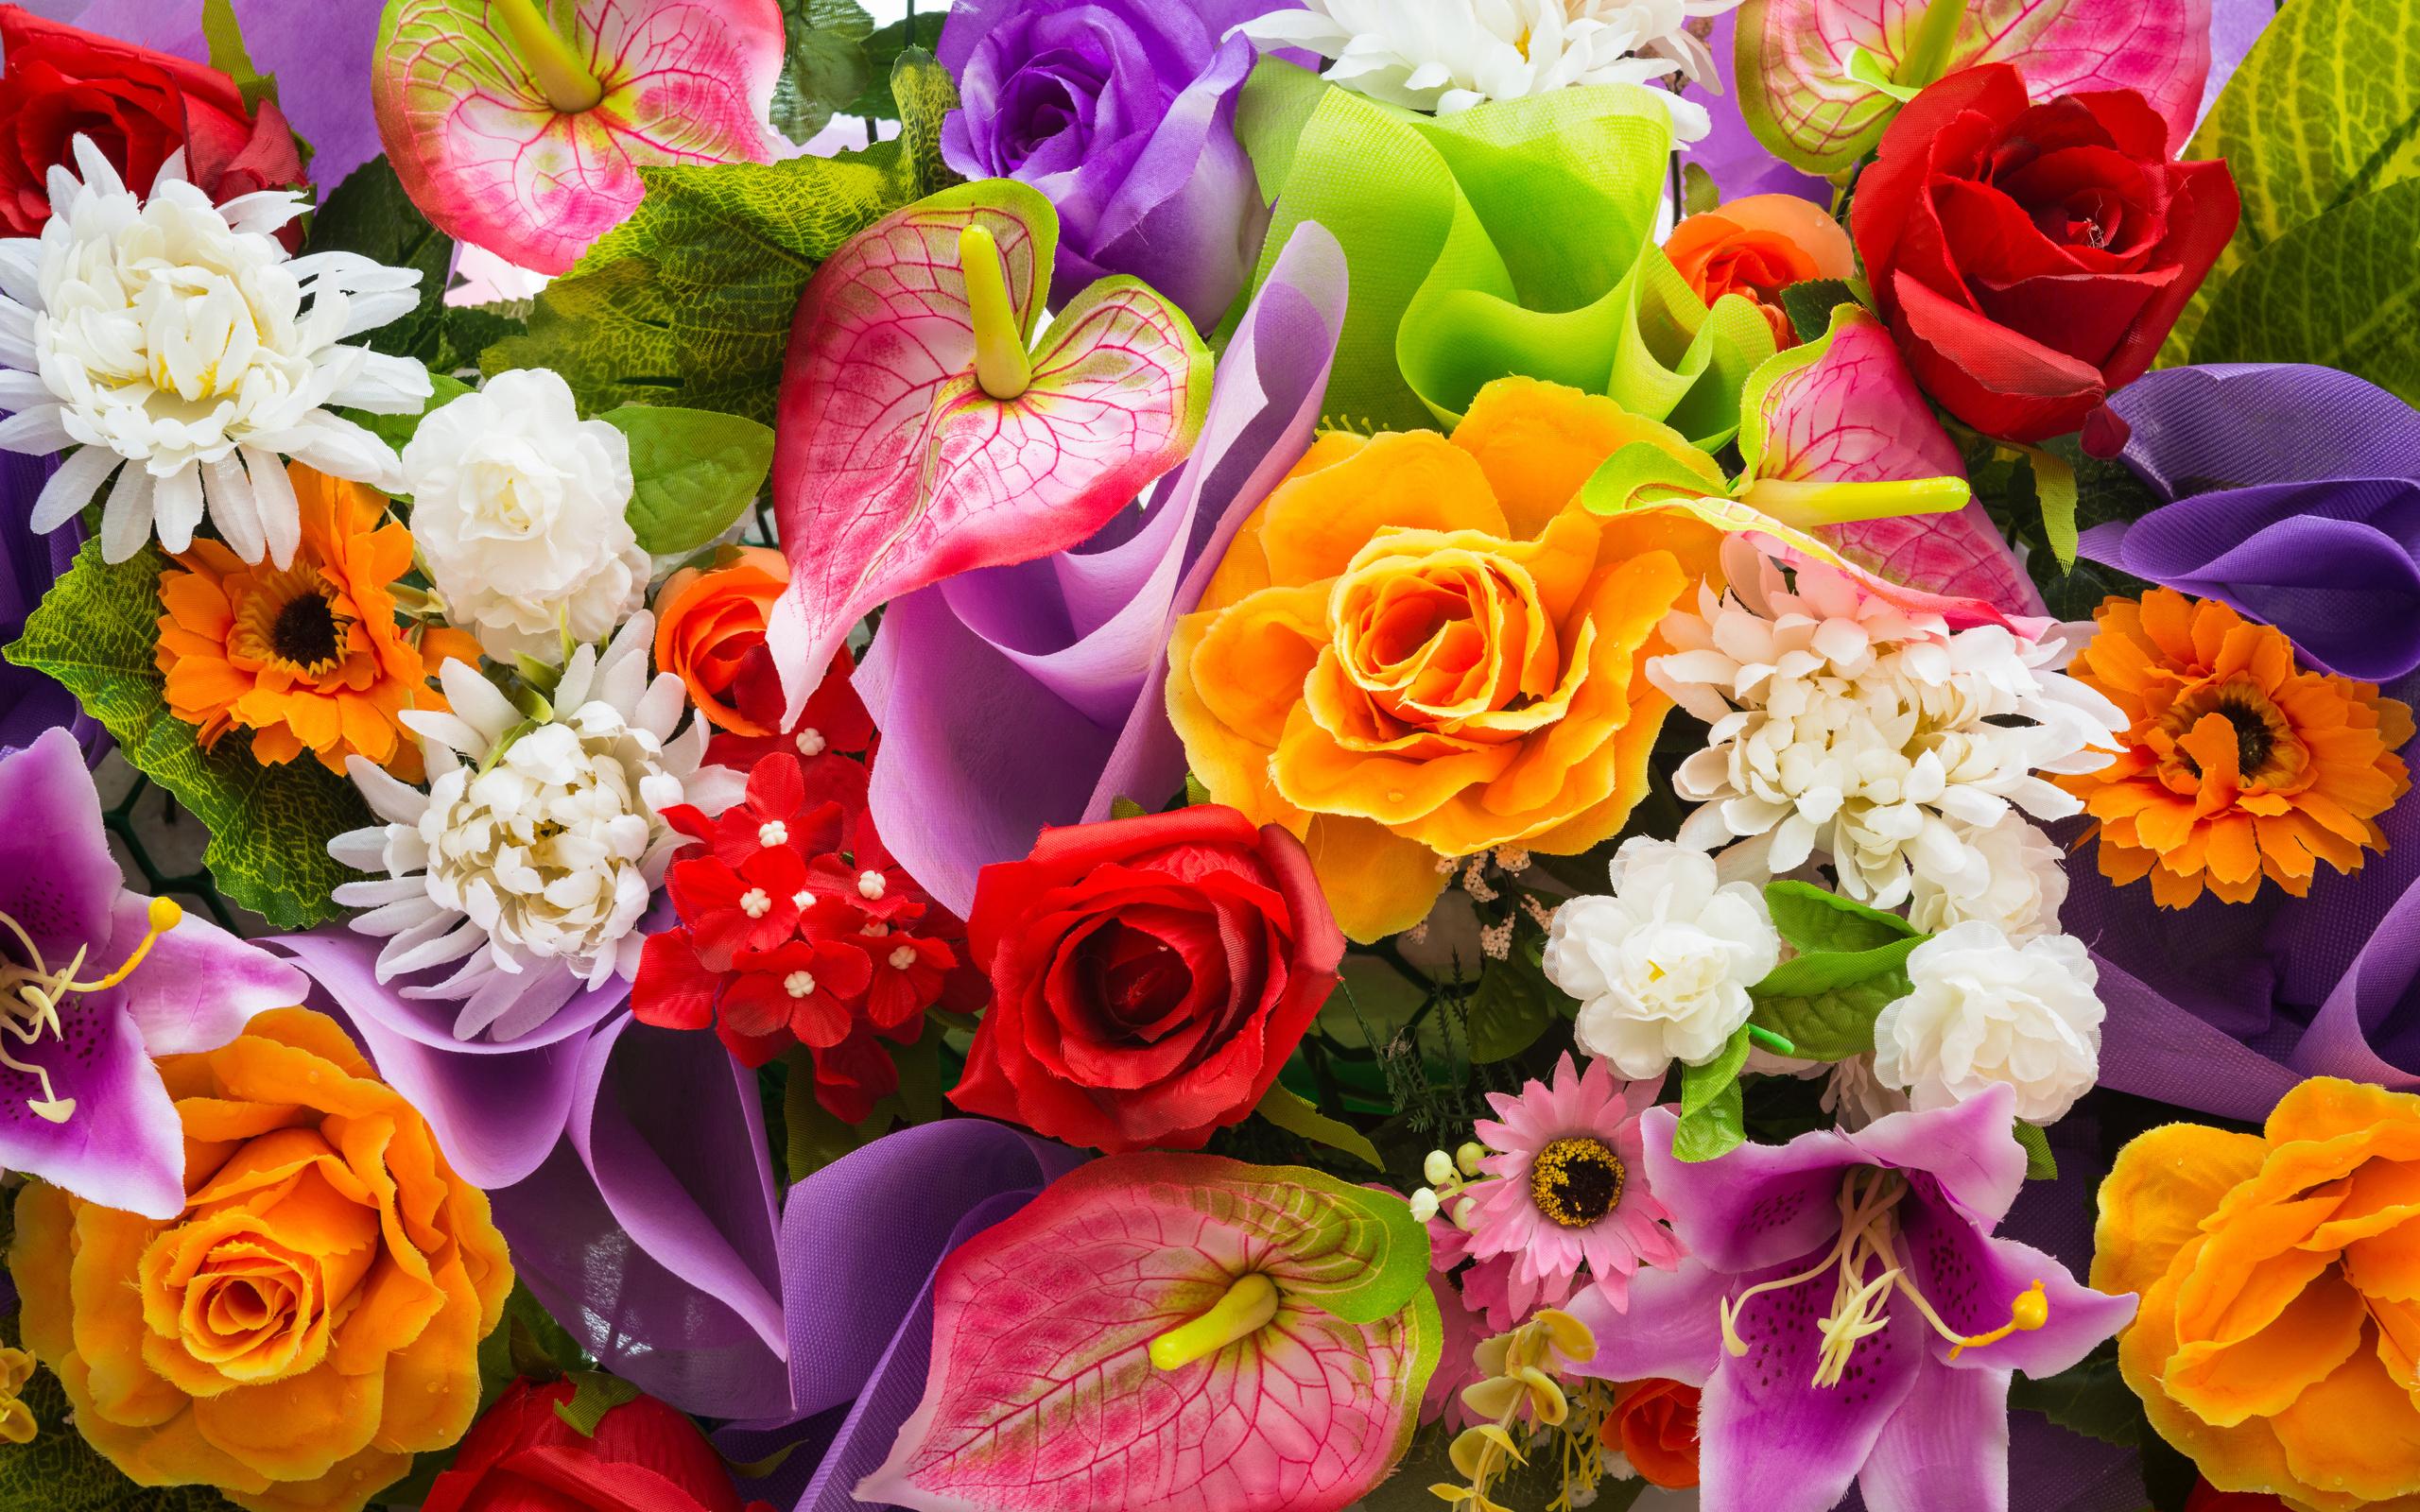 بالصور صور اجمل الورود , اجمل الورود واحلاها 3662 7